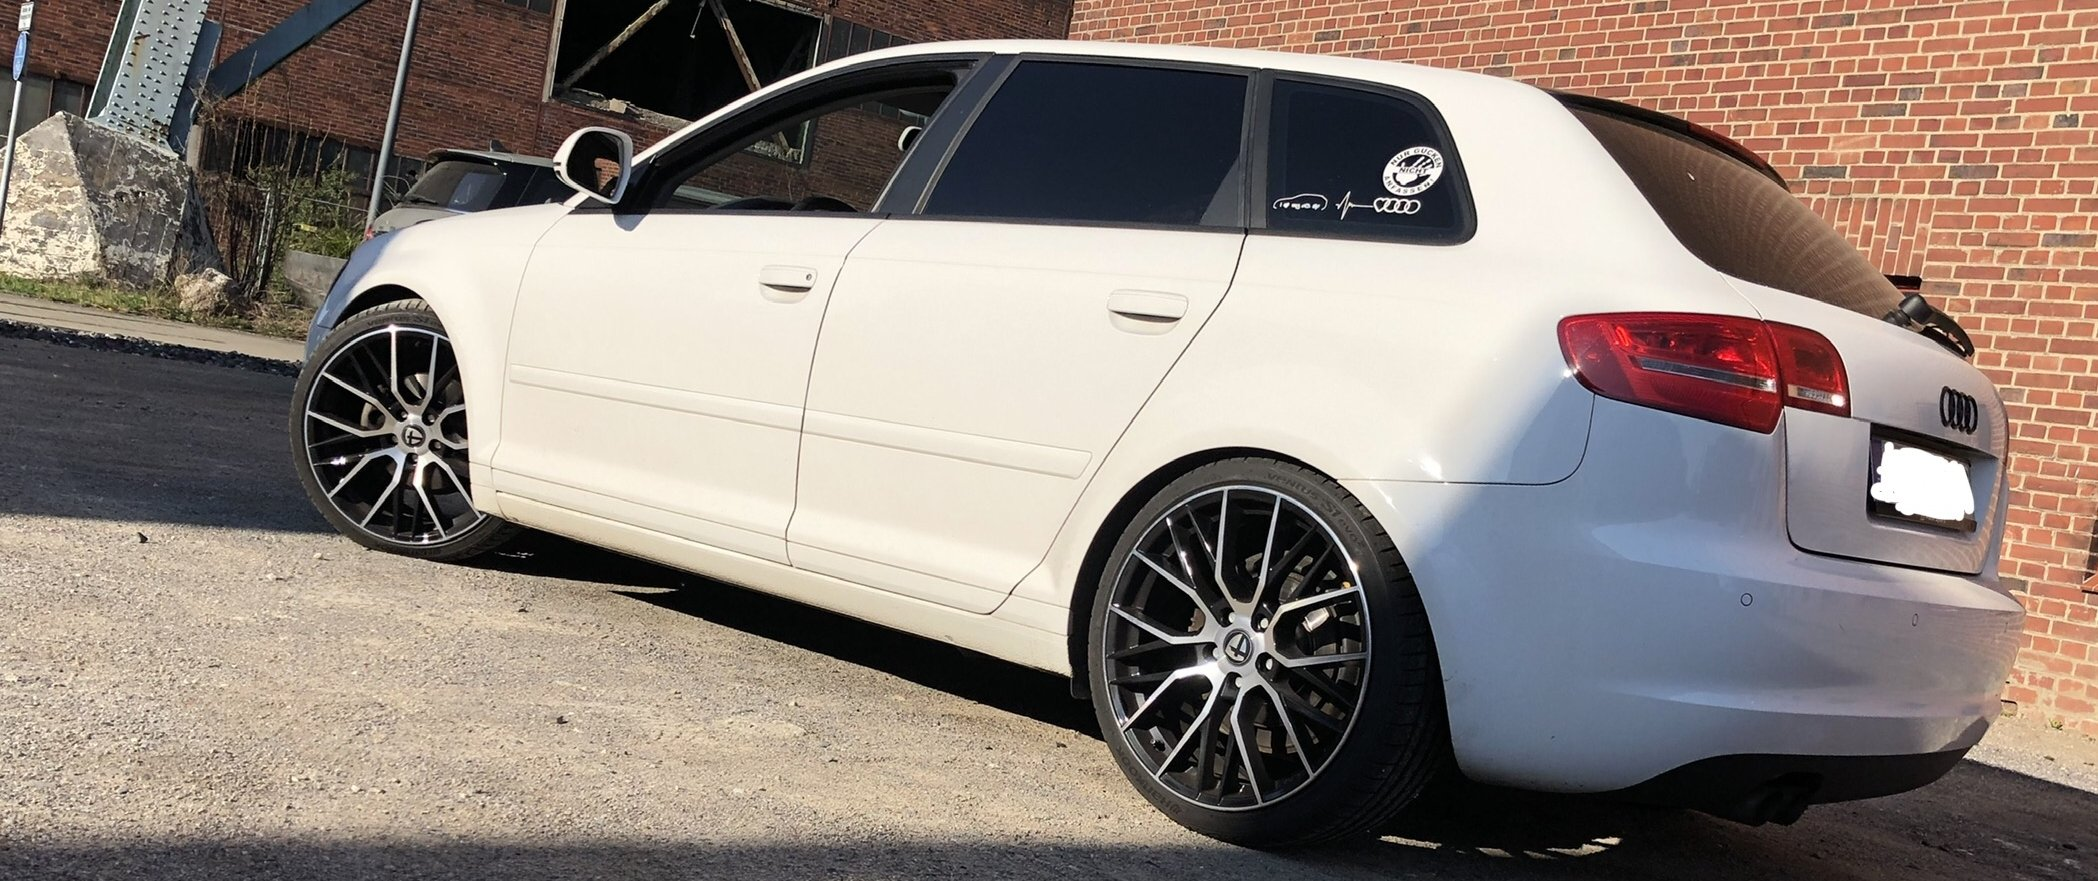 Audi – A3 – TOMASON – TN23 – Schwarz – 19 Zoll